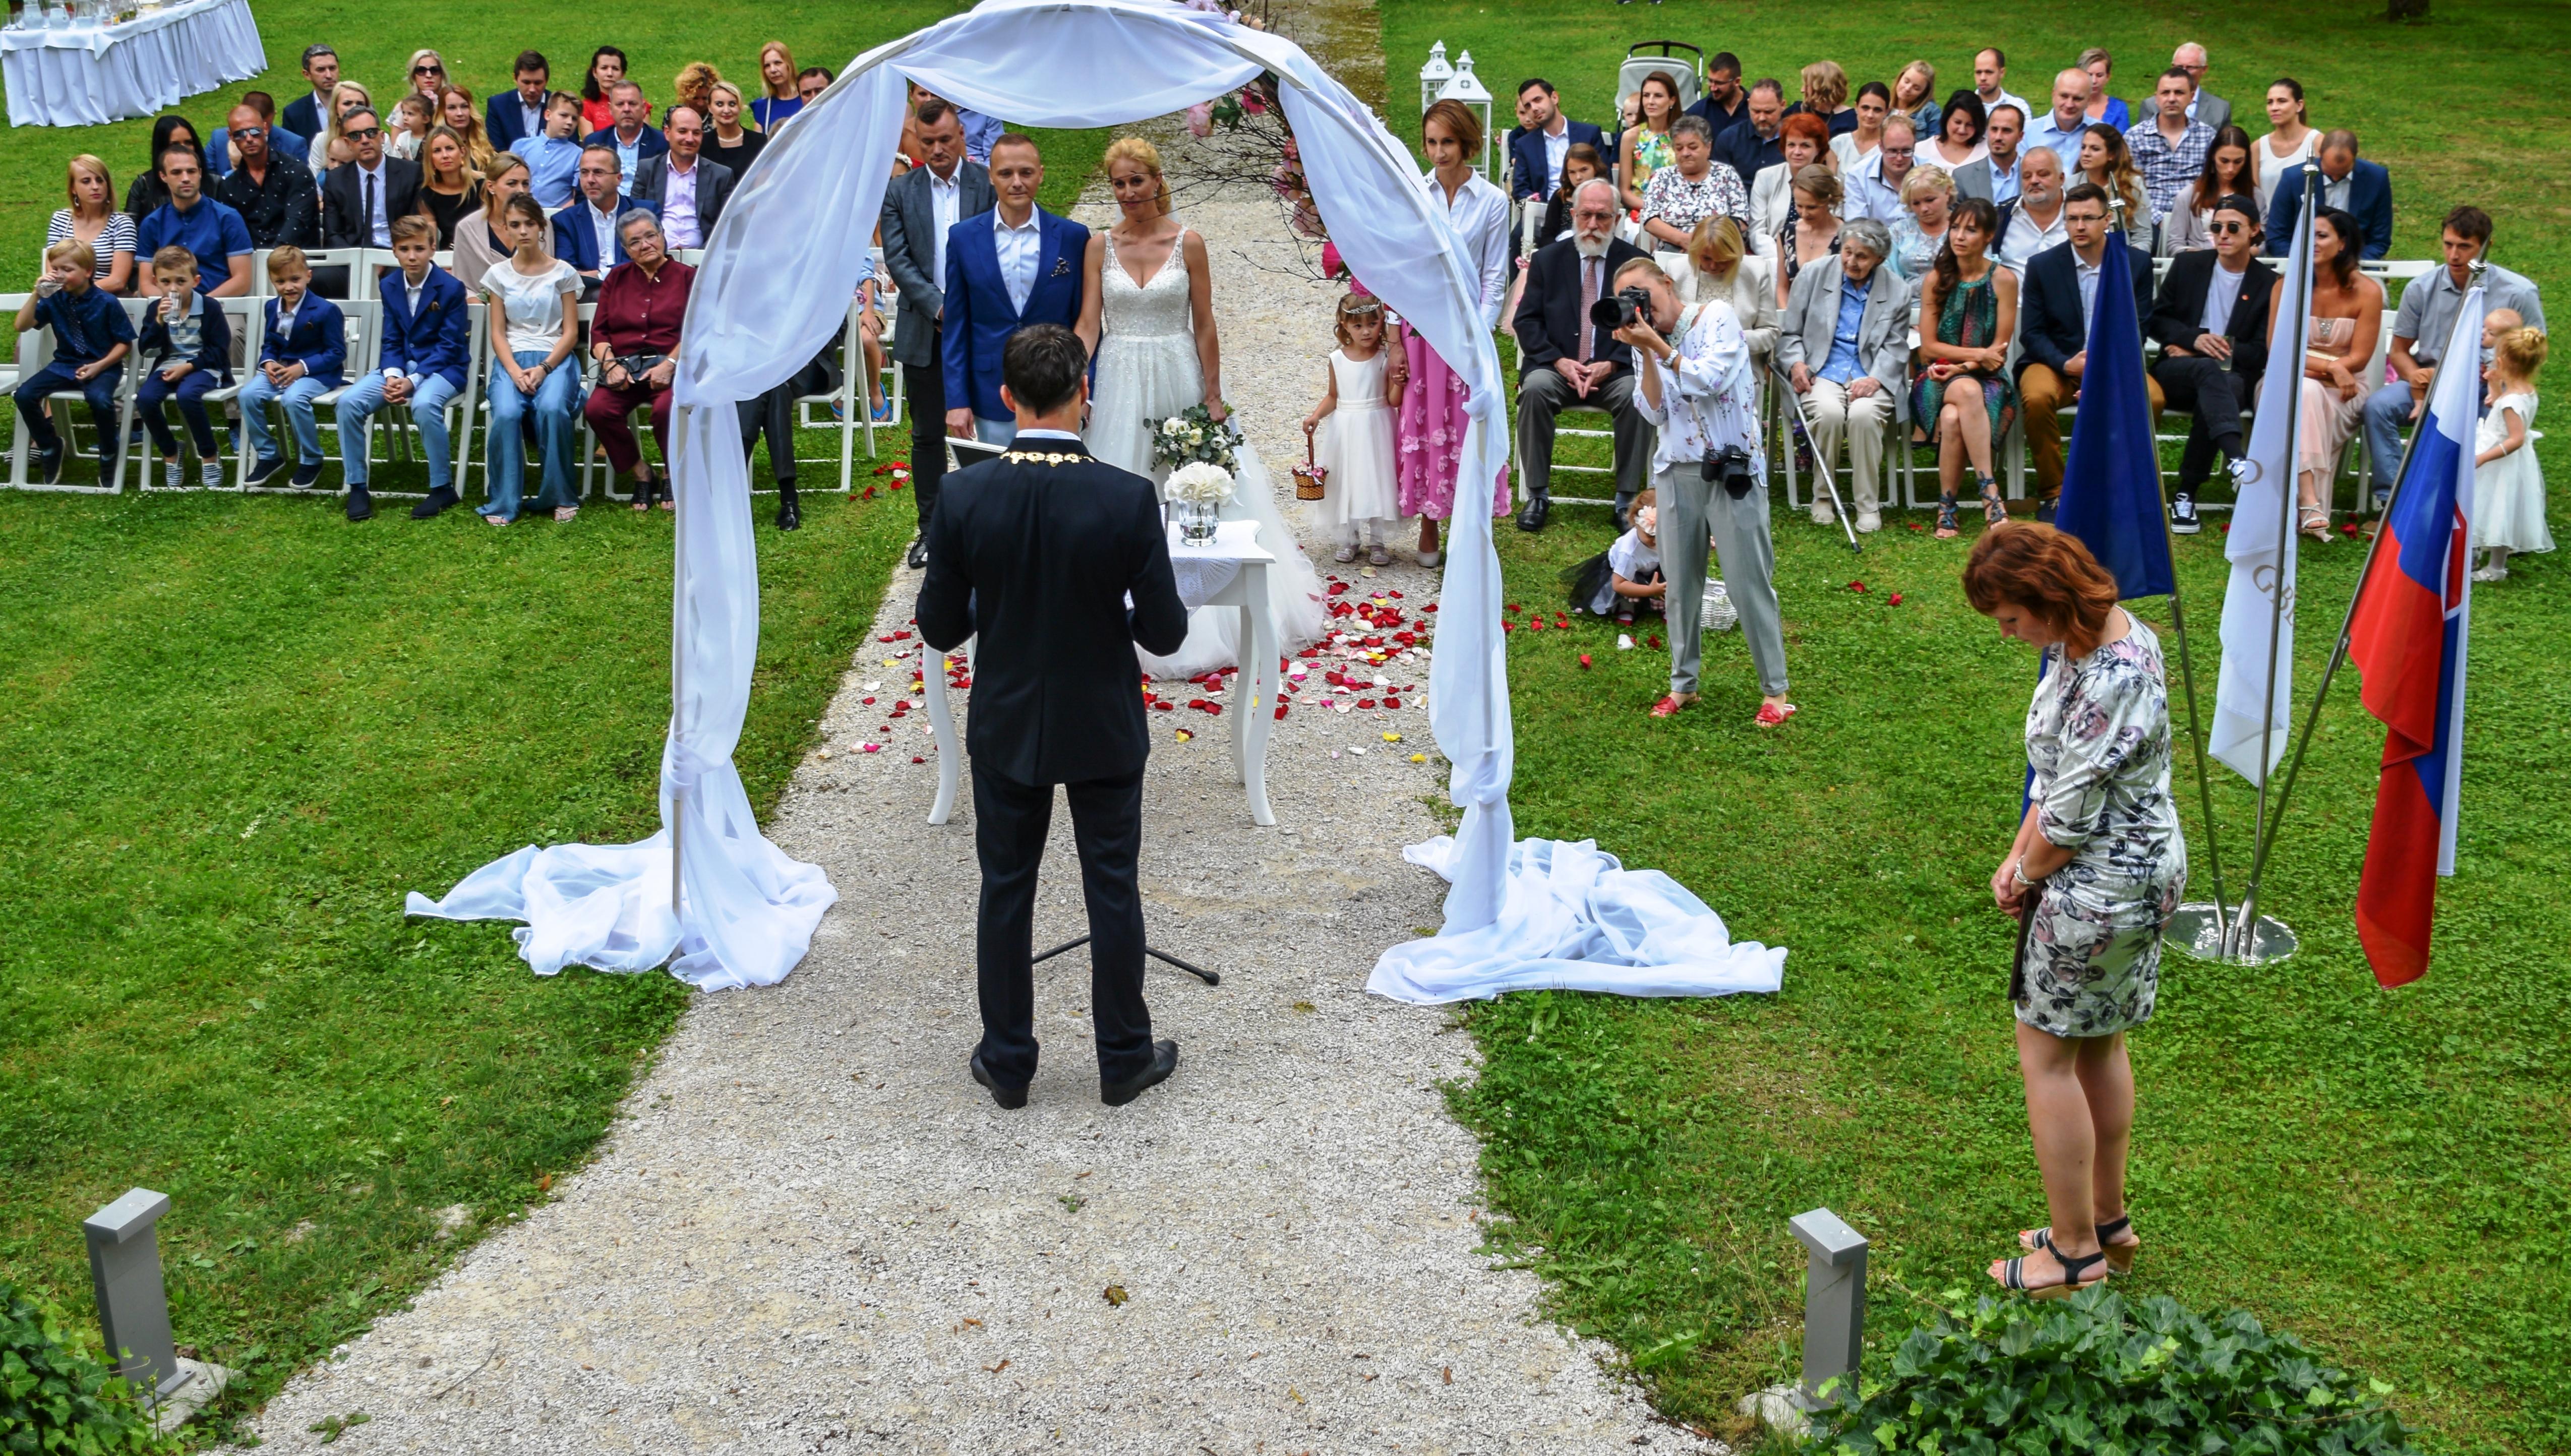 Svadba Hotel Kaštieľ Gbeľany 01, #svadobnyDJ, #djanasvadbu, #svadba, #Gbelany